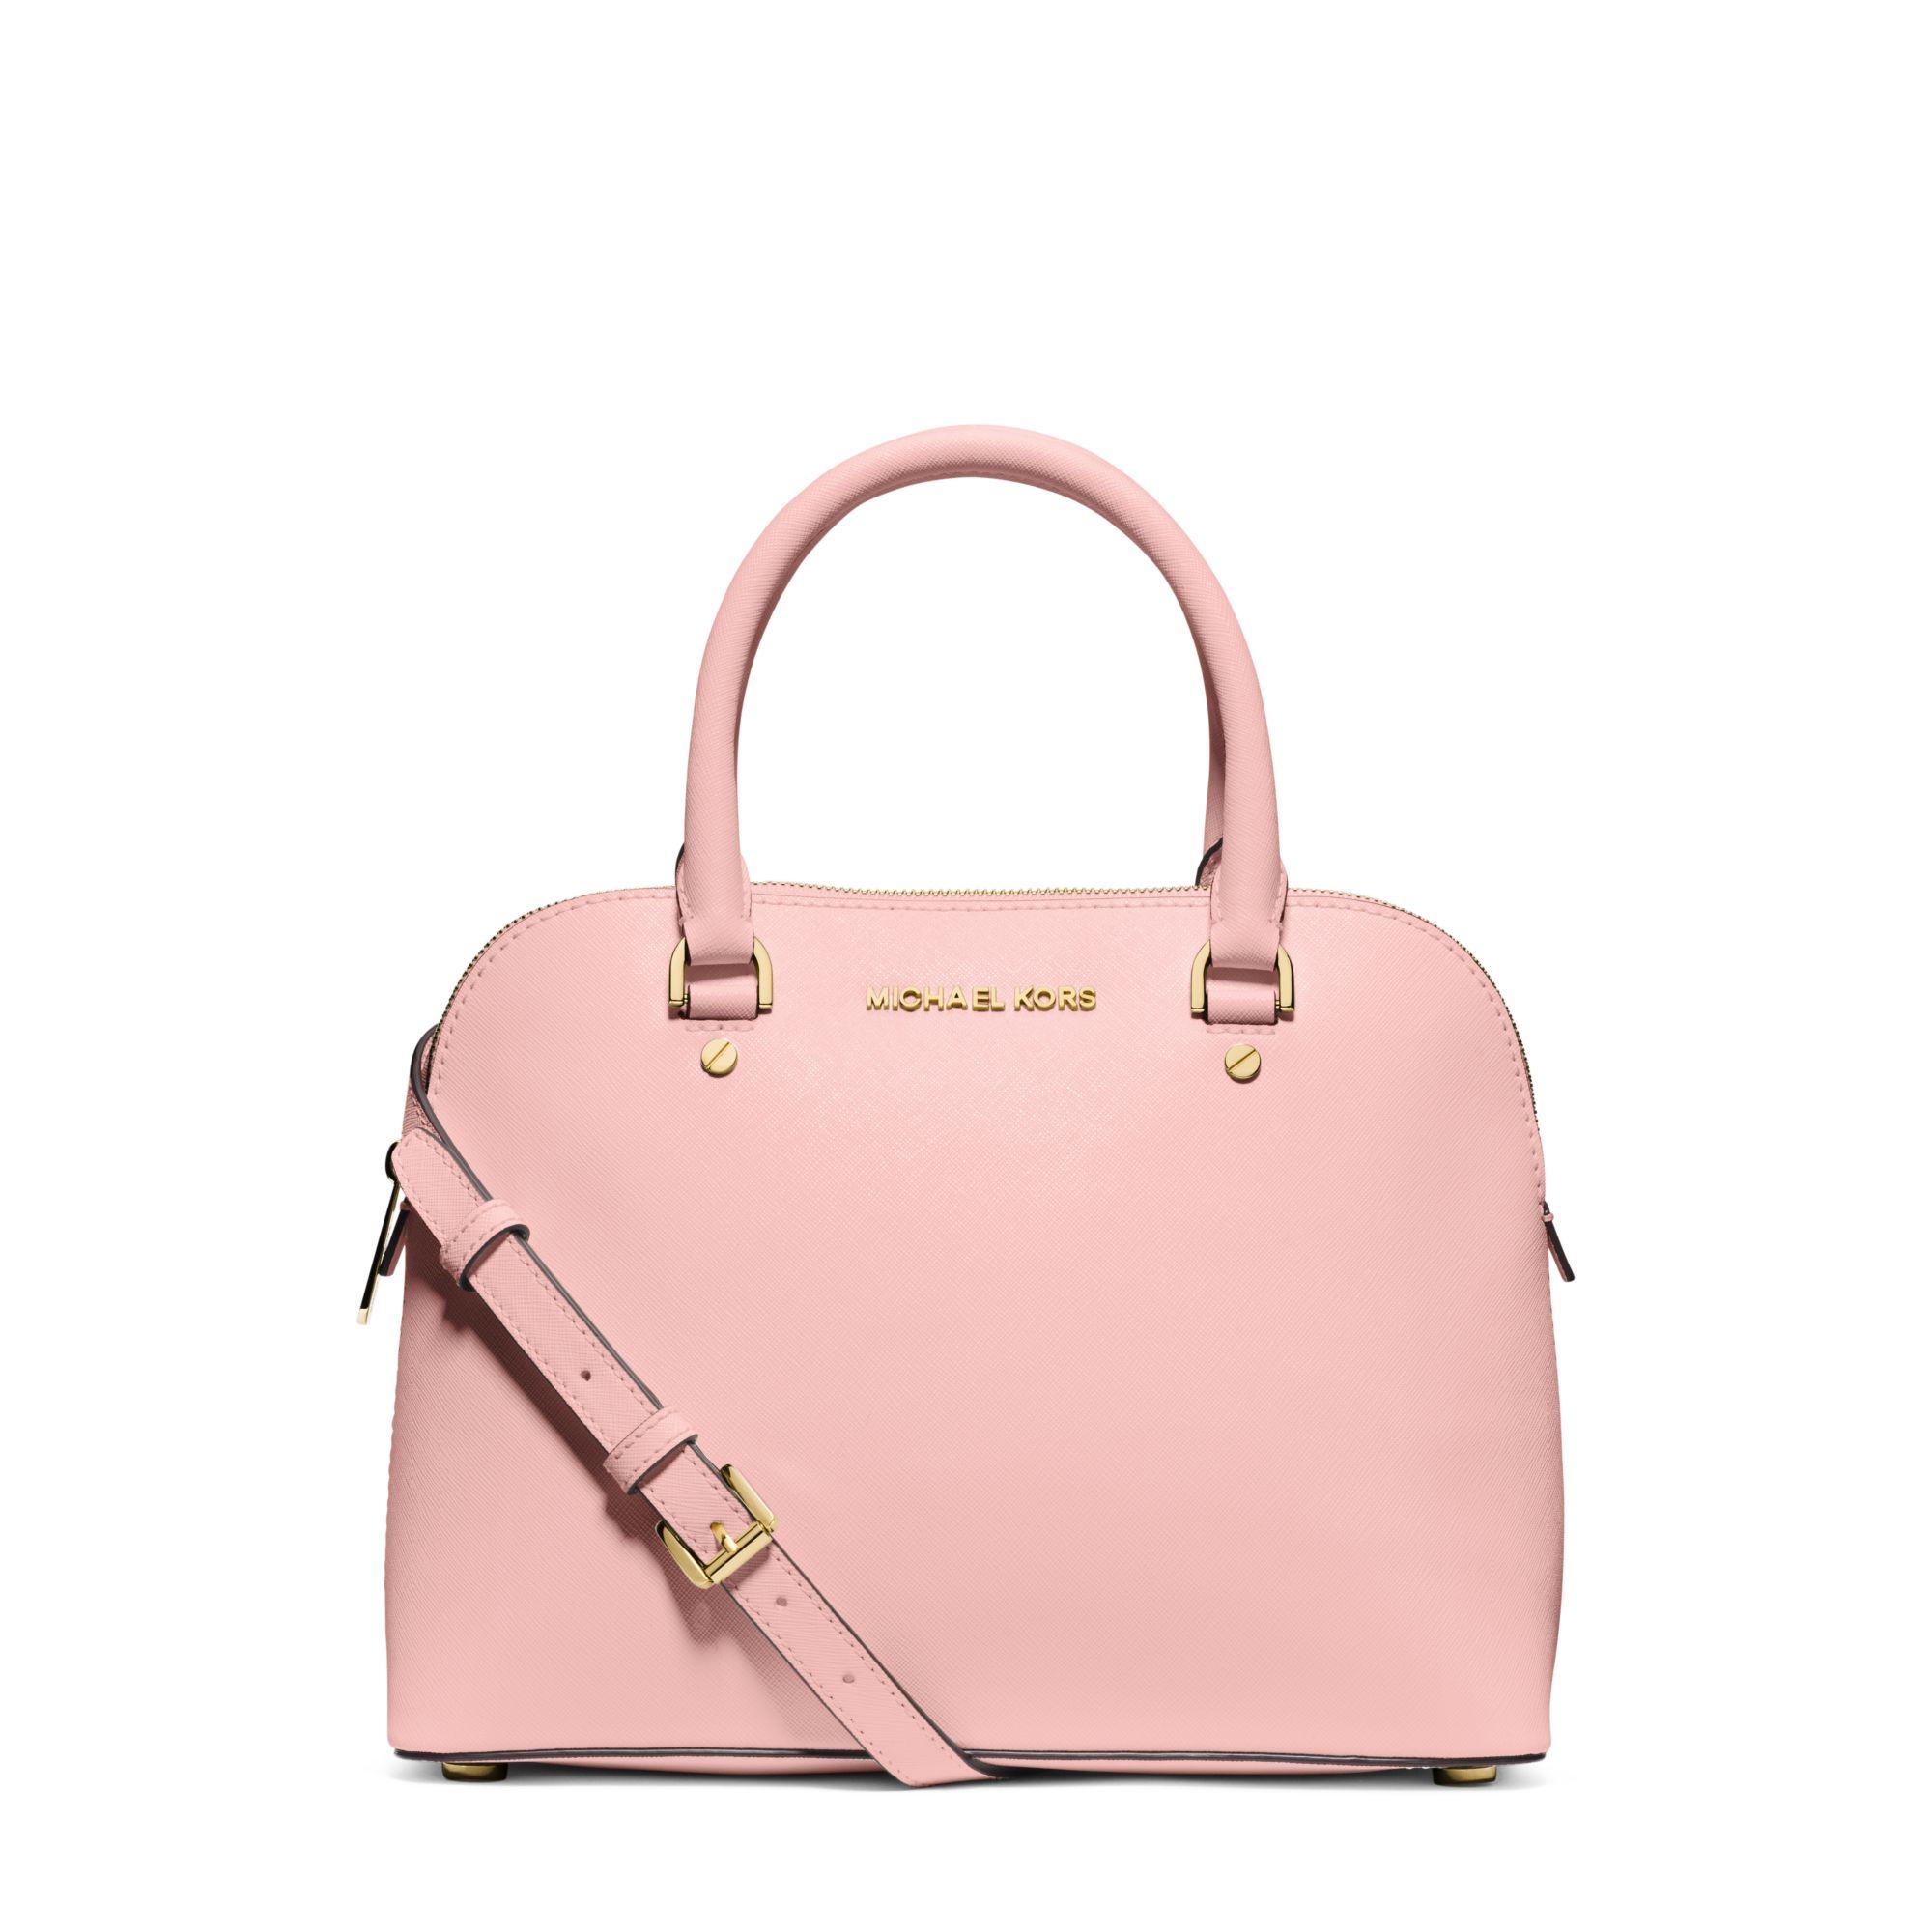 1e41924ce06e Michael Kors Cindy Medium Saffiano Leather Satchel in Pink - Lyst